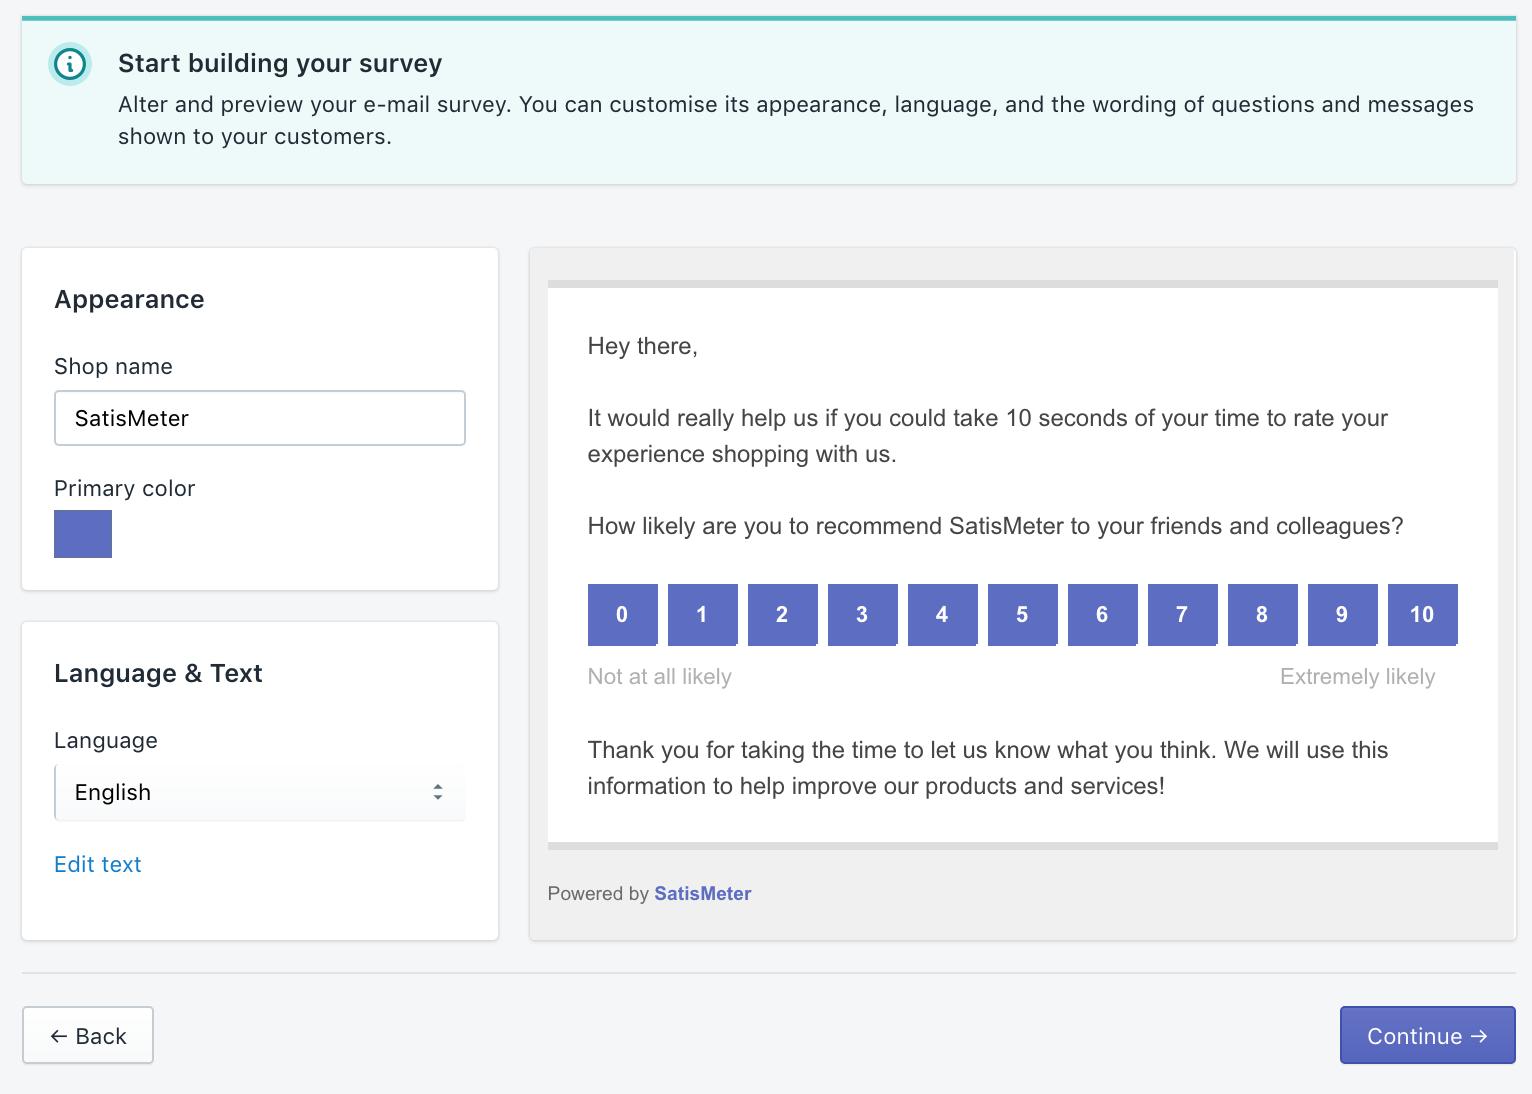 SatisMeter - Shopify integration appearance